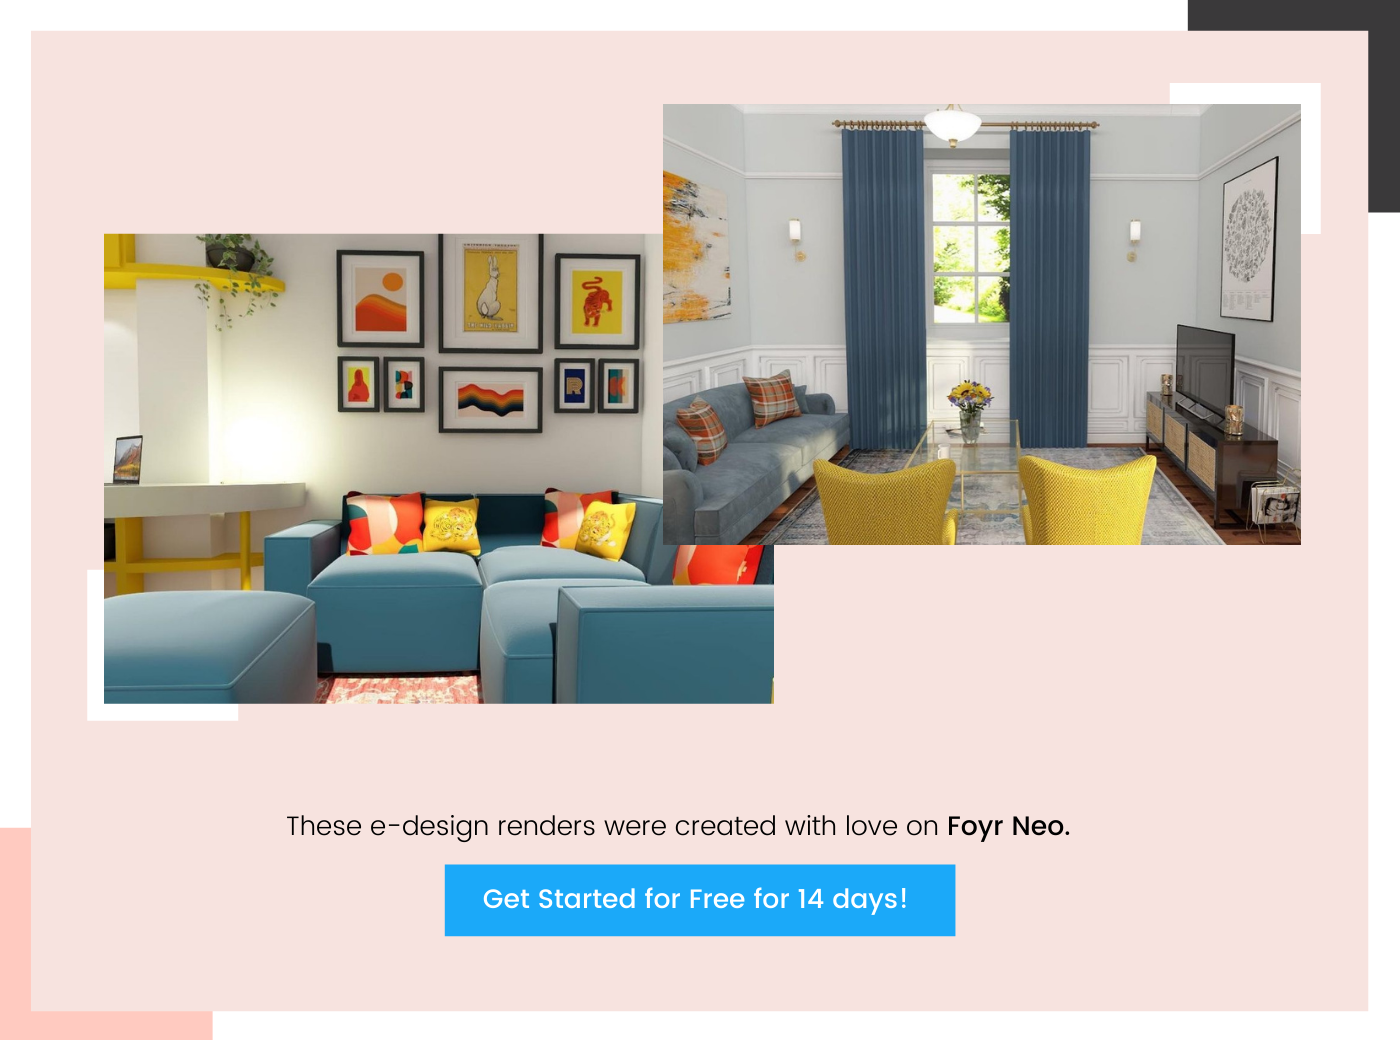 foyr e-design renders 4